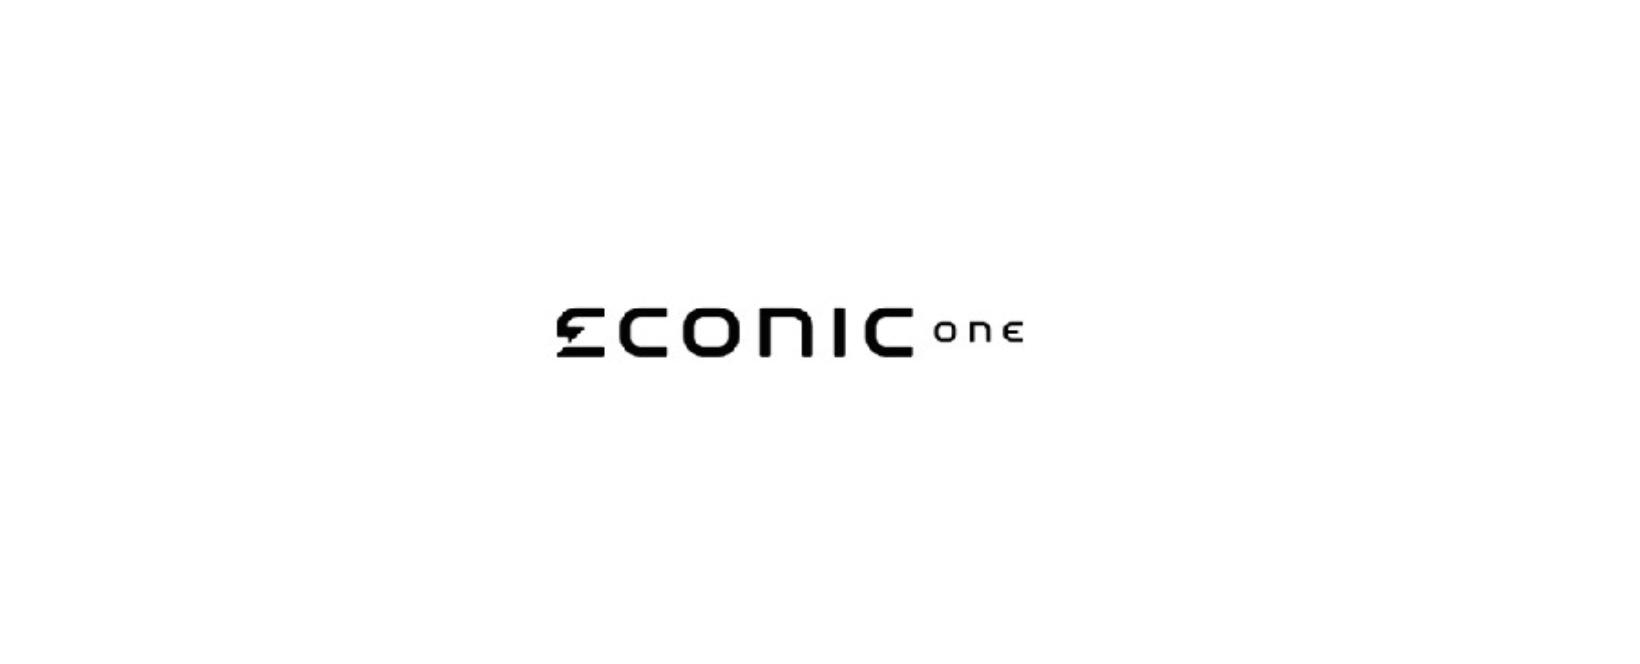 Econic One Discount Code 2021